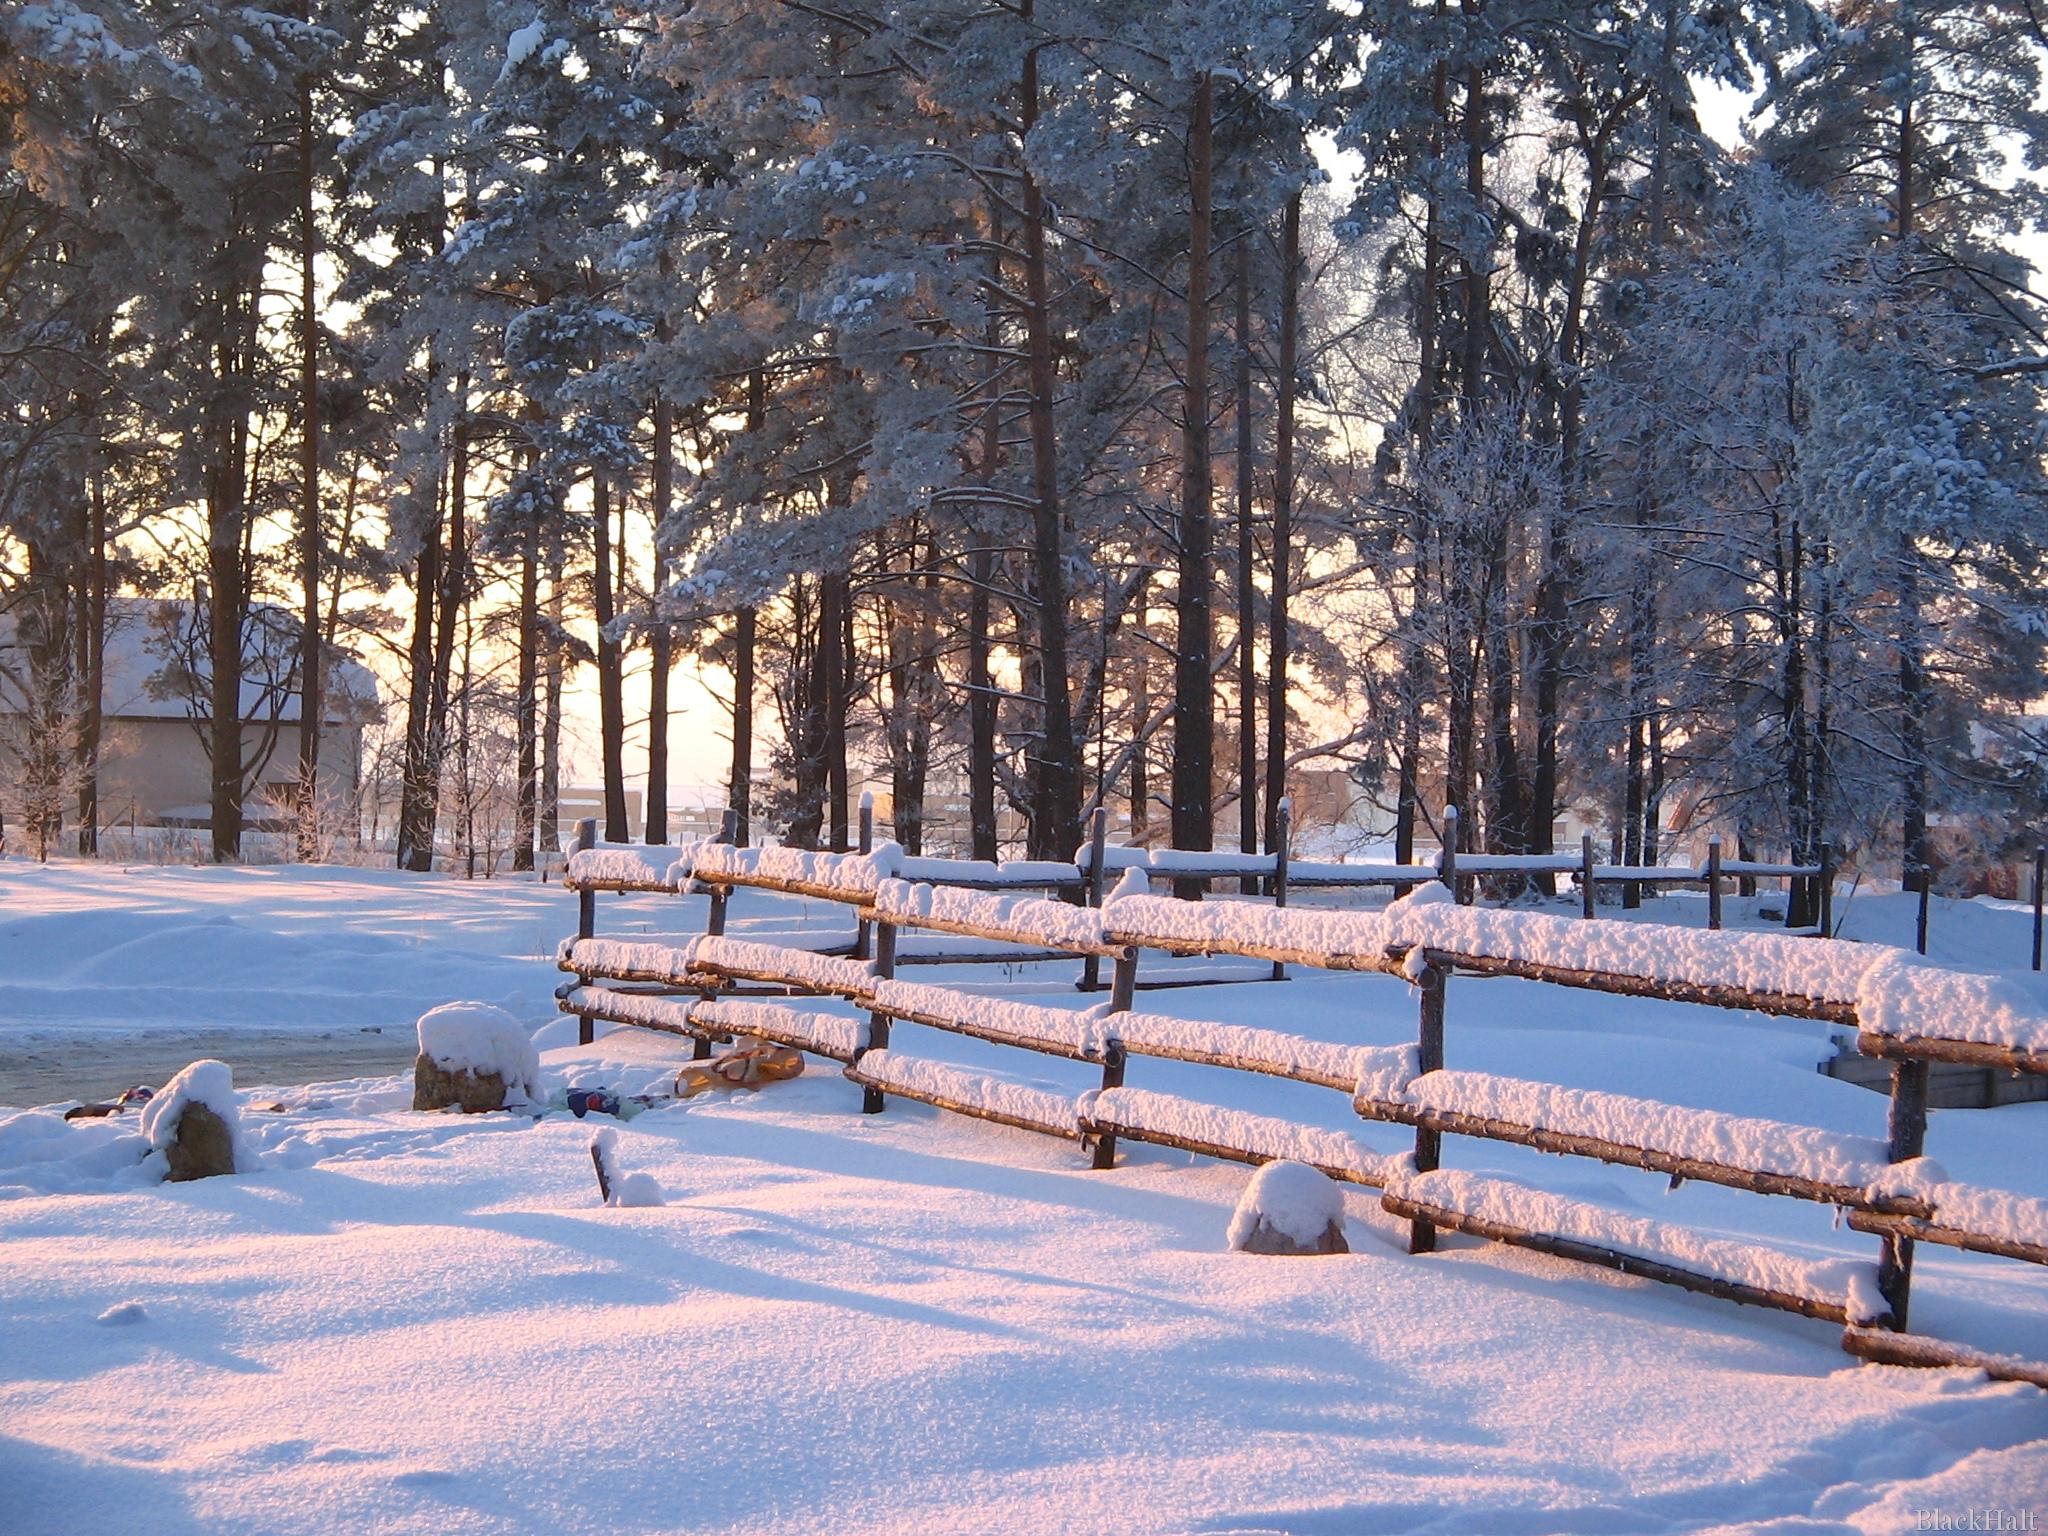 Sniegots skats #4